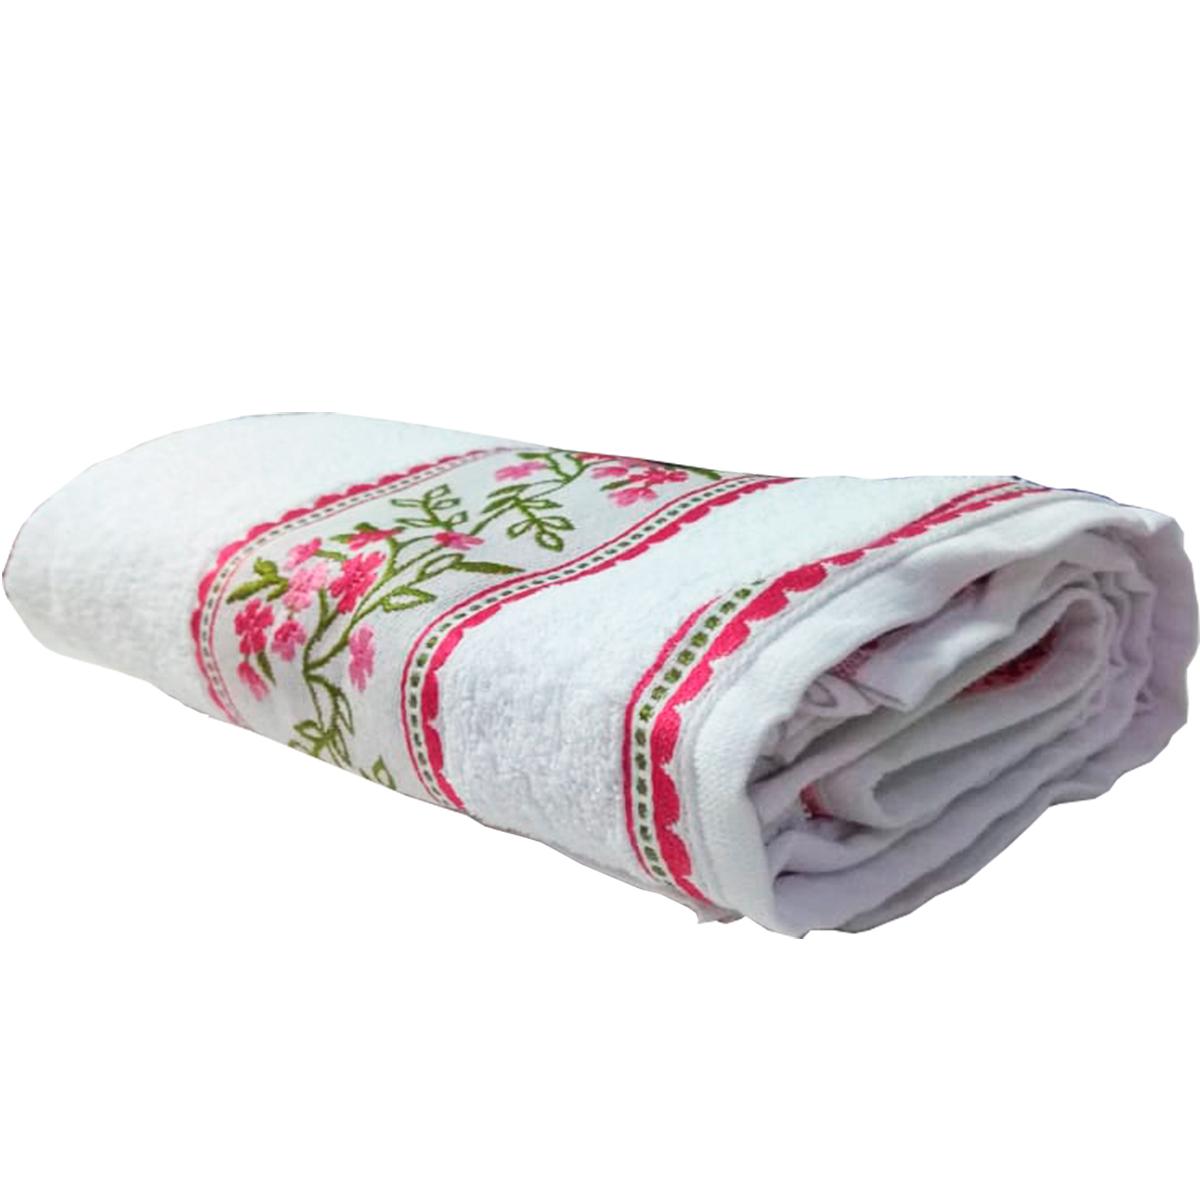 Toalha de Banho Candy Branca Lufamar